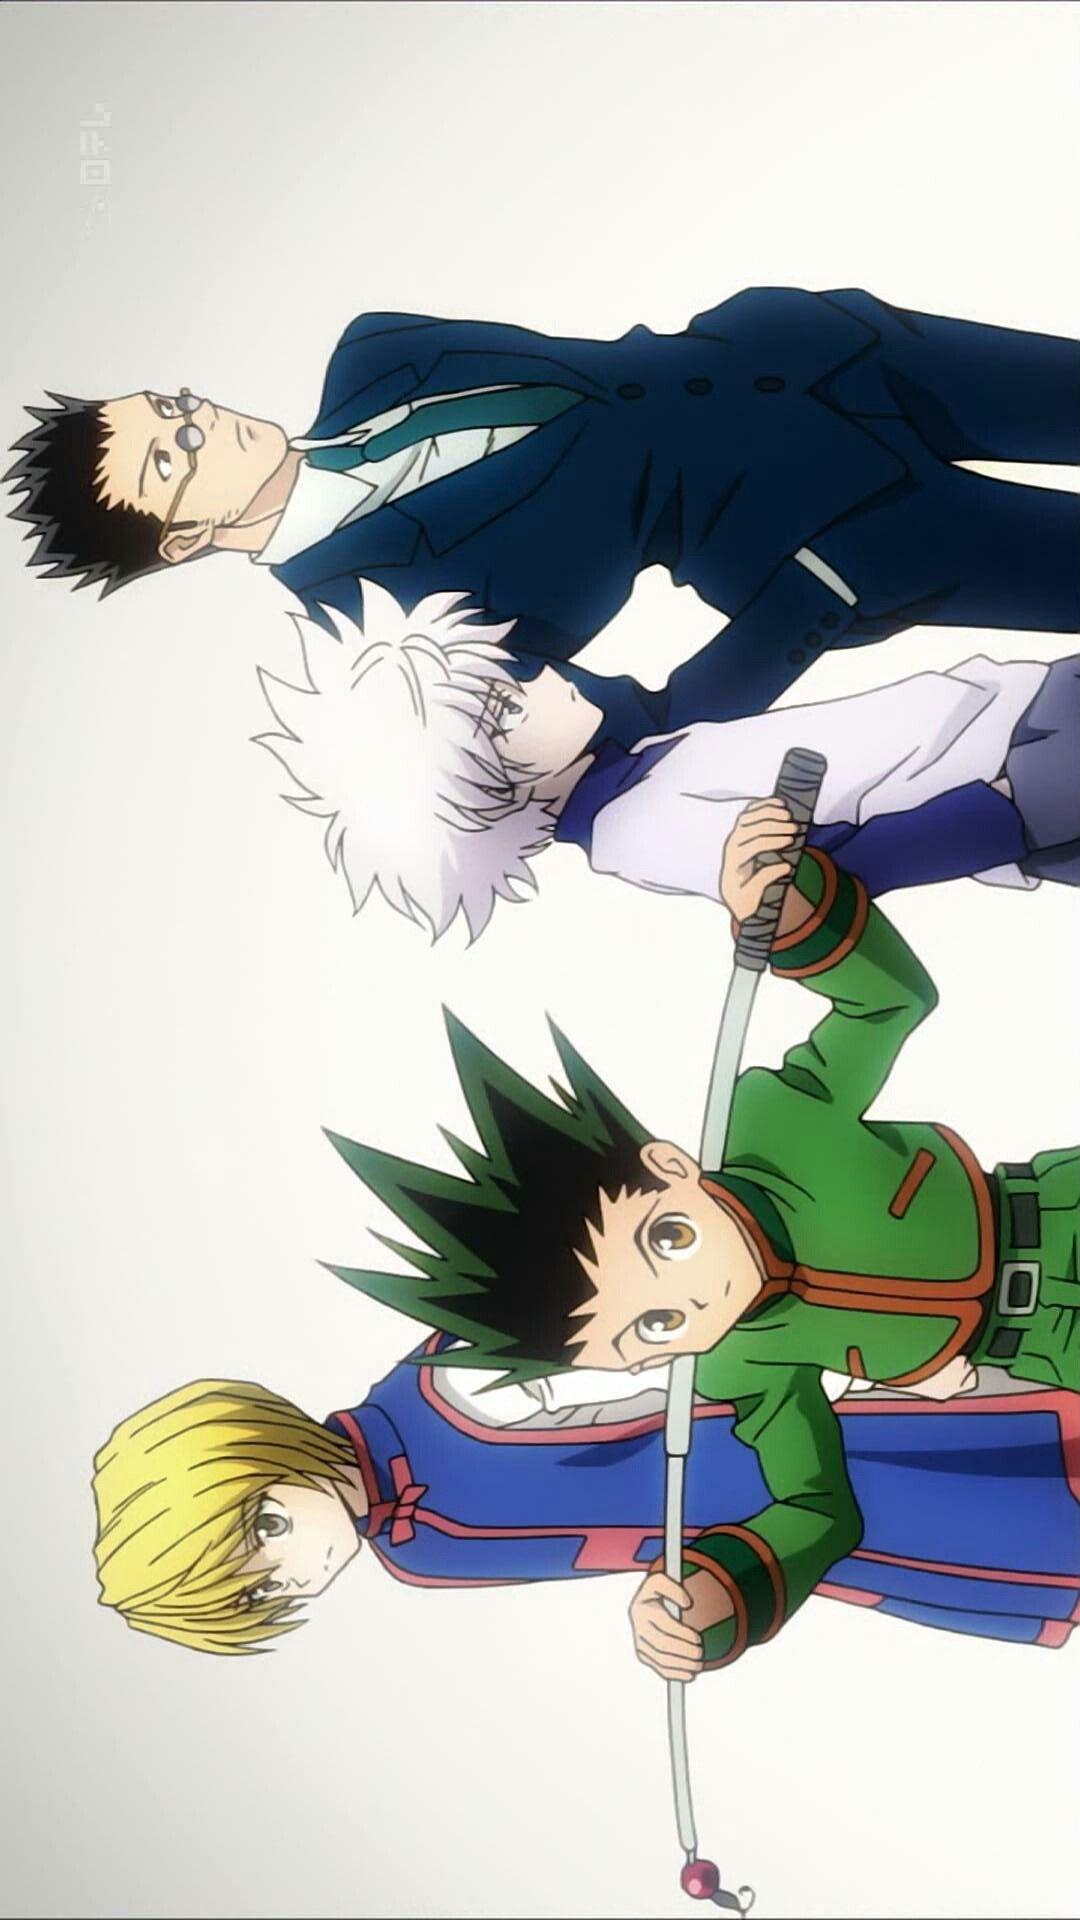 Gon / Killua / Kurapika / Leorio / HxH / Hunter x Hunter